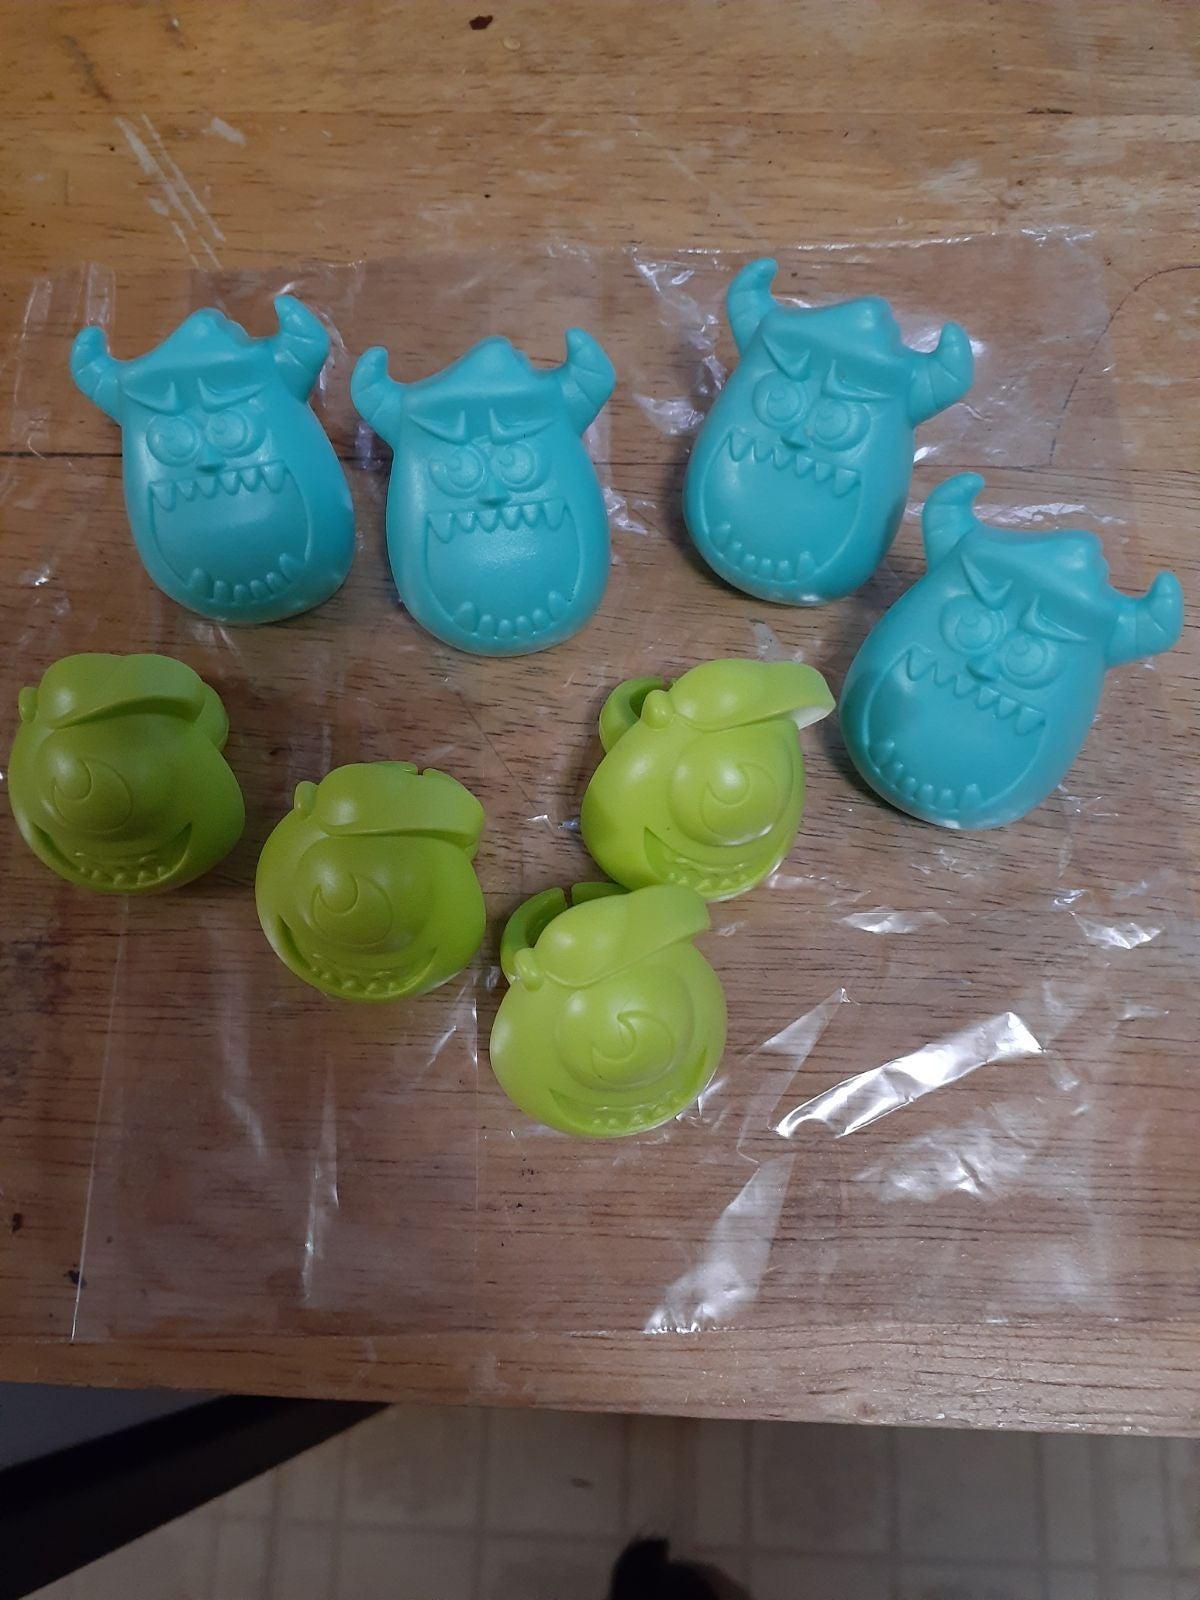 Monsters inc cupcake topper rings